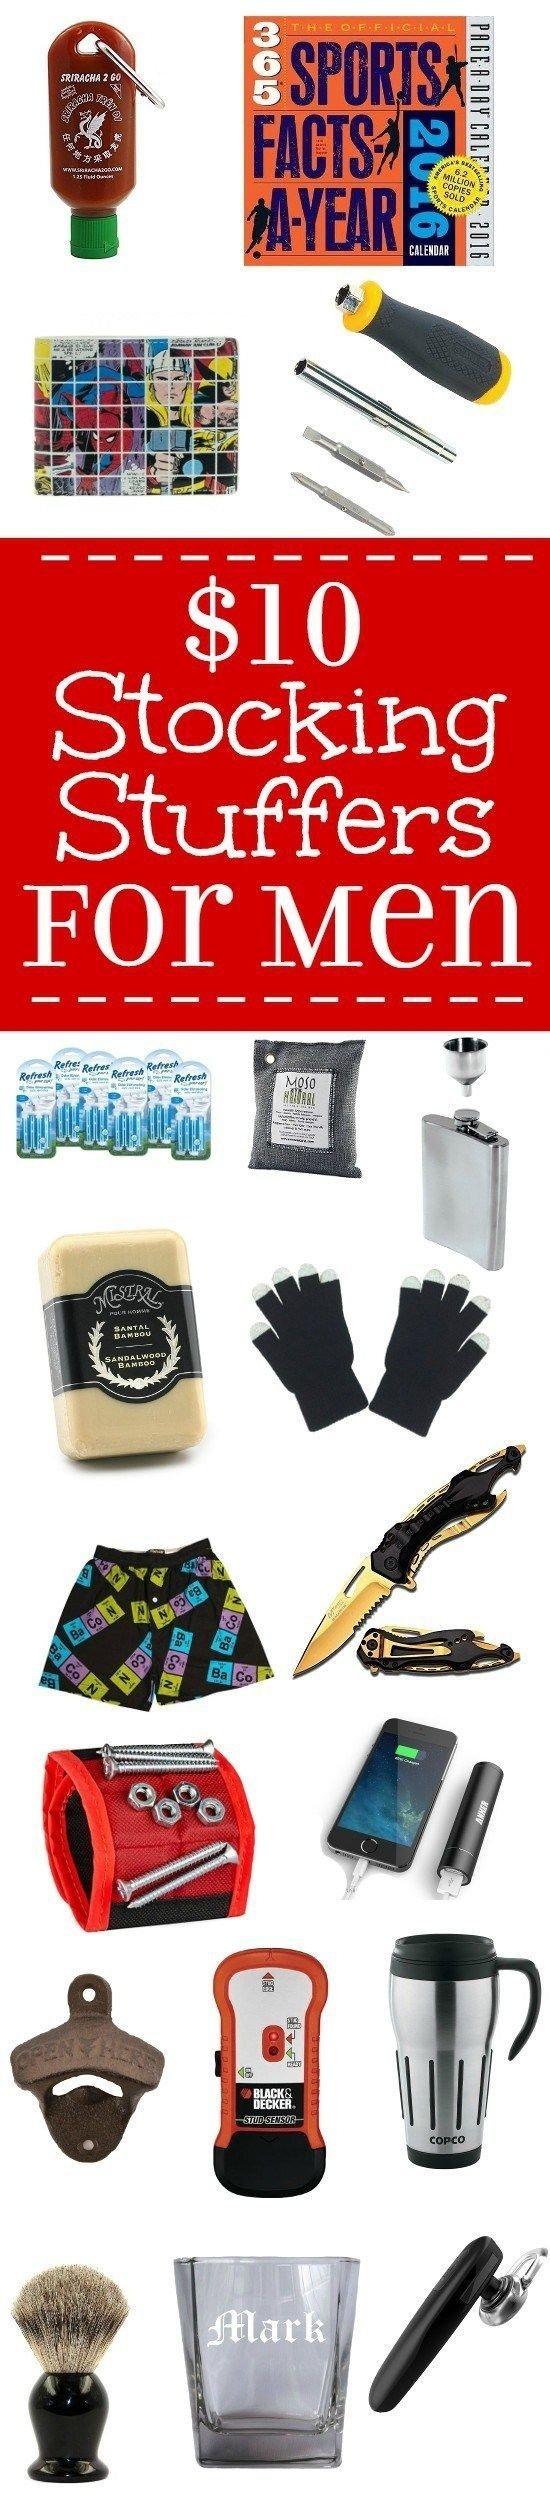 10 Fabulous Stocking Stuffers For Men Ideas christmas gifts and stocking stuffers ideas for men 25 stocking 3 2020